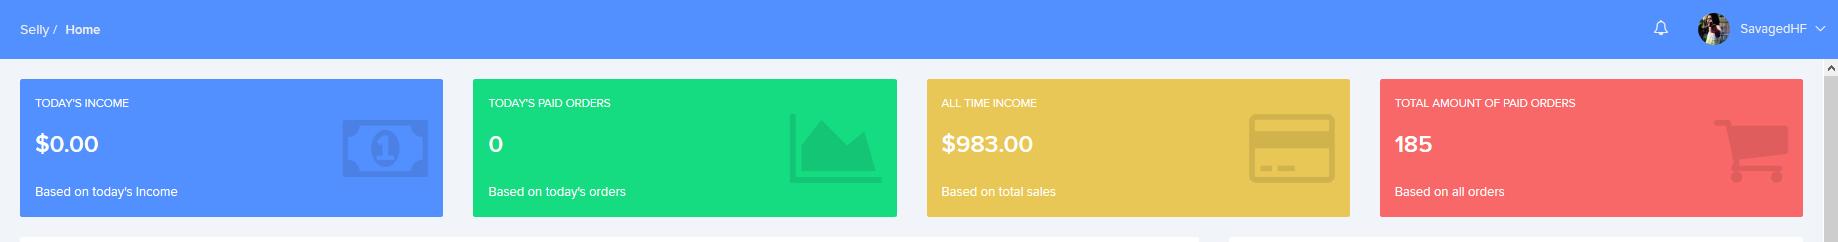 Fortnite Shop Sale (Discord/Selly) 1 1k Earnings